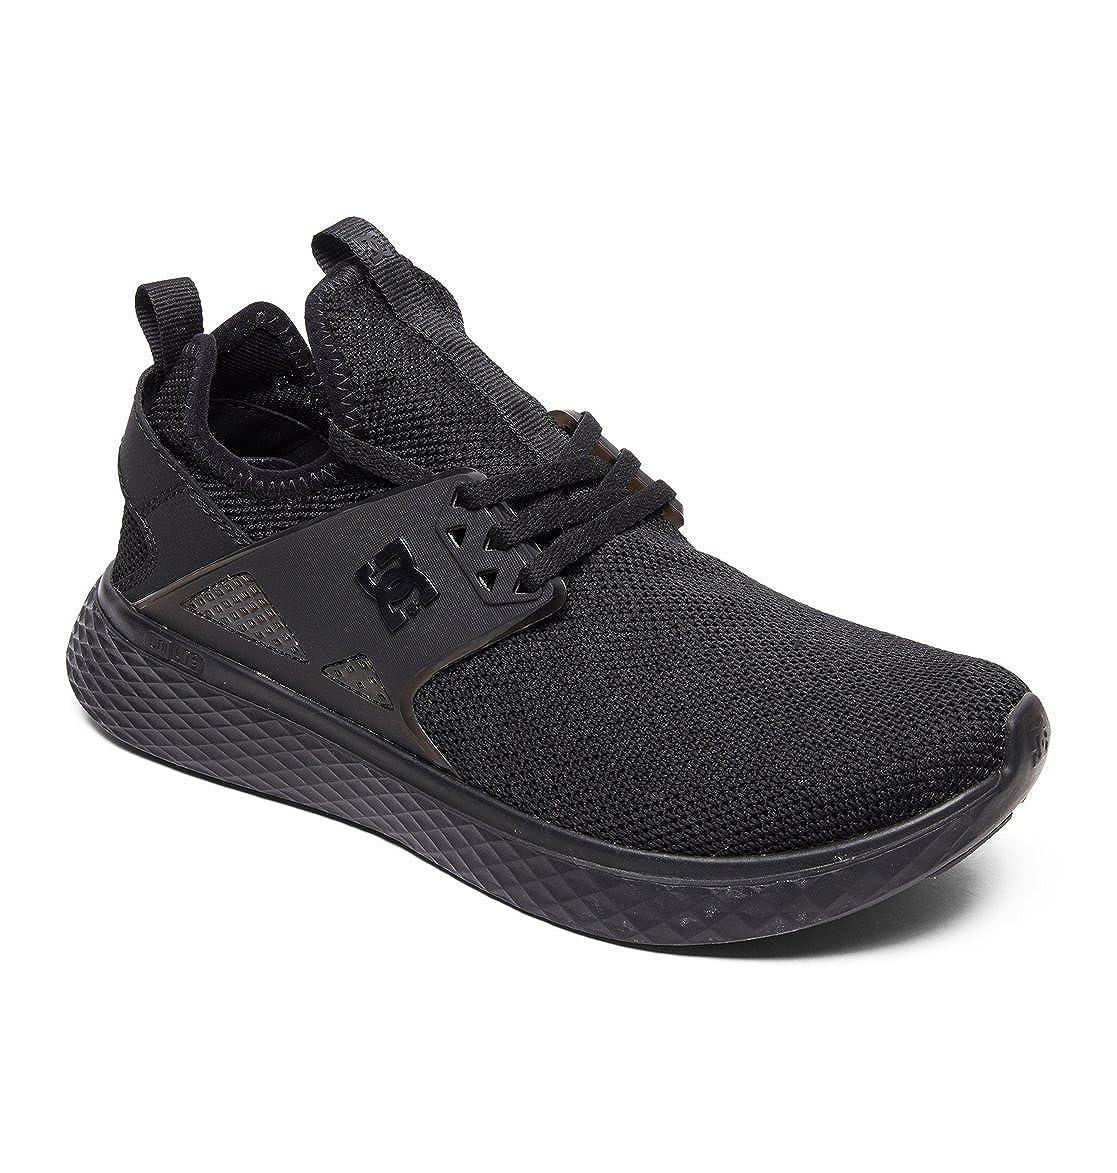 DC schuhe Meridian - Schuhe für Männer ADYS700125 ADYS700125 ADYS700125  1fa5ed